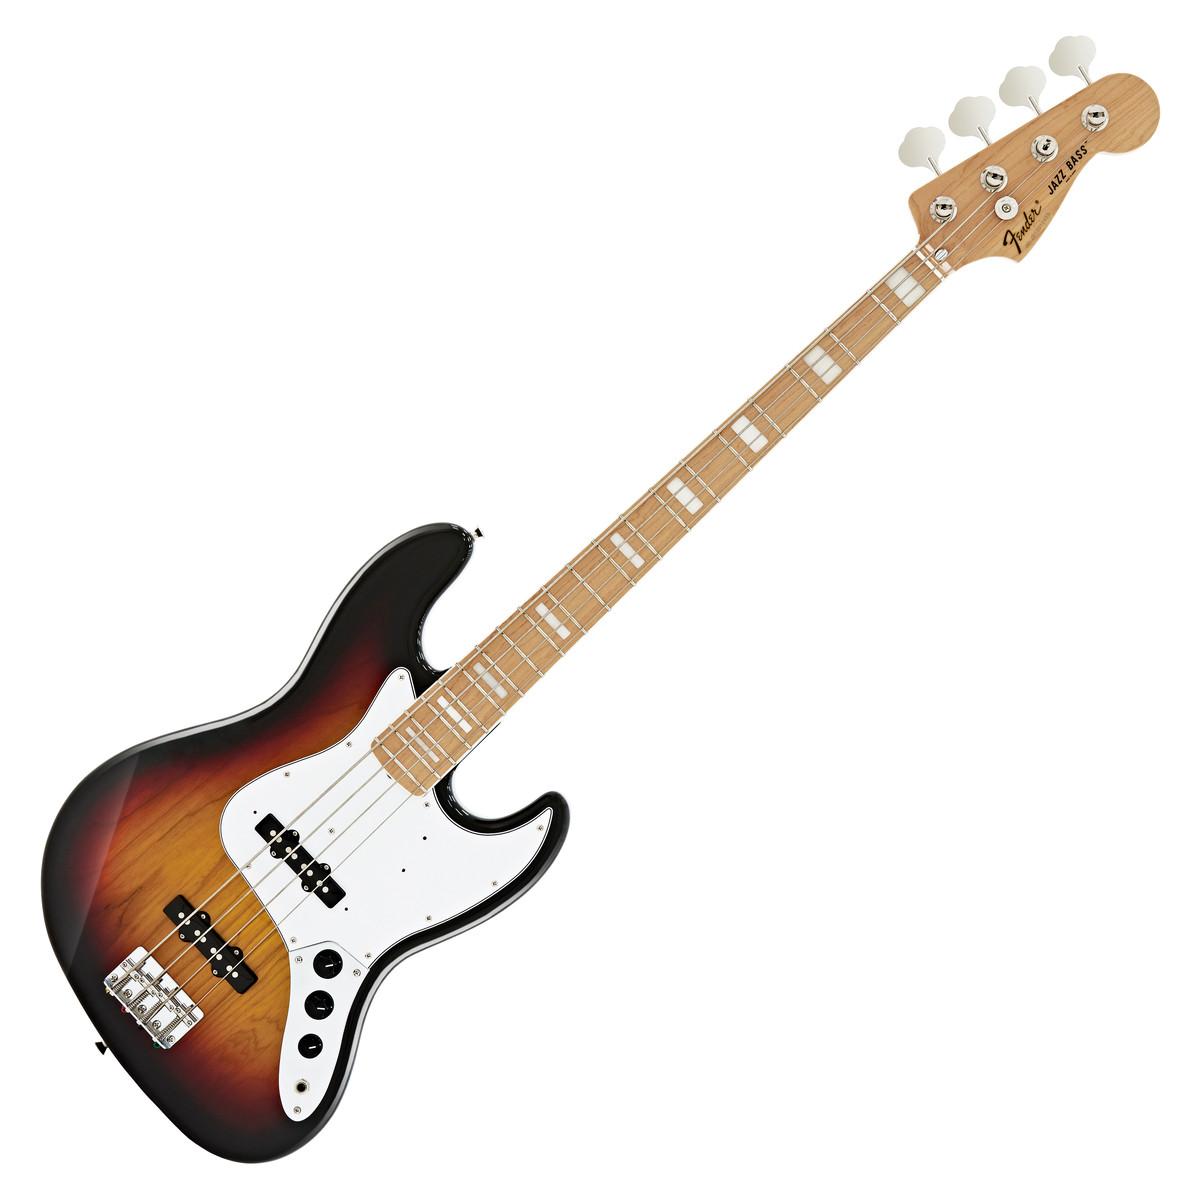 disc fender japon fsr classique 70 39 s jazz bass guitare. Black Bedroom Furniture Sets. Home Design Ideas